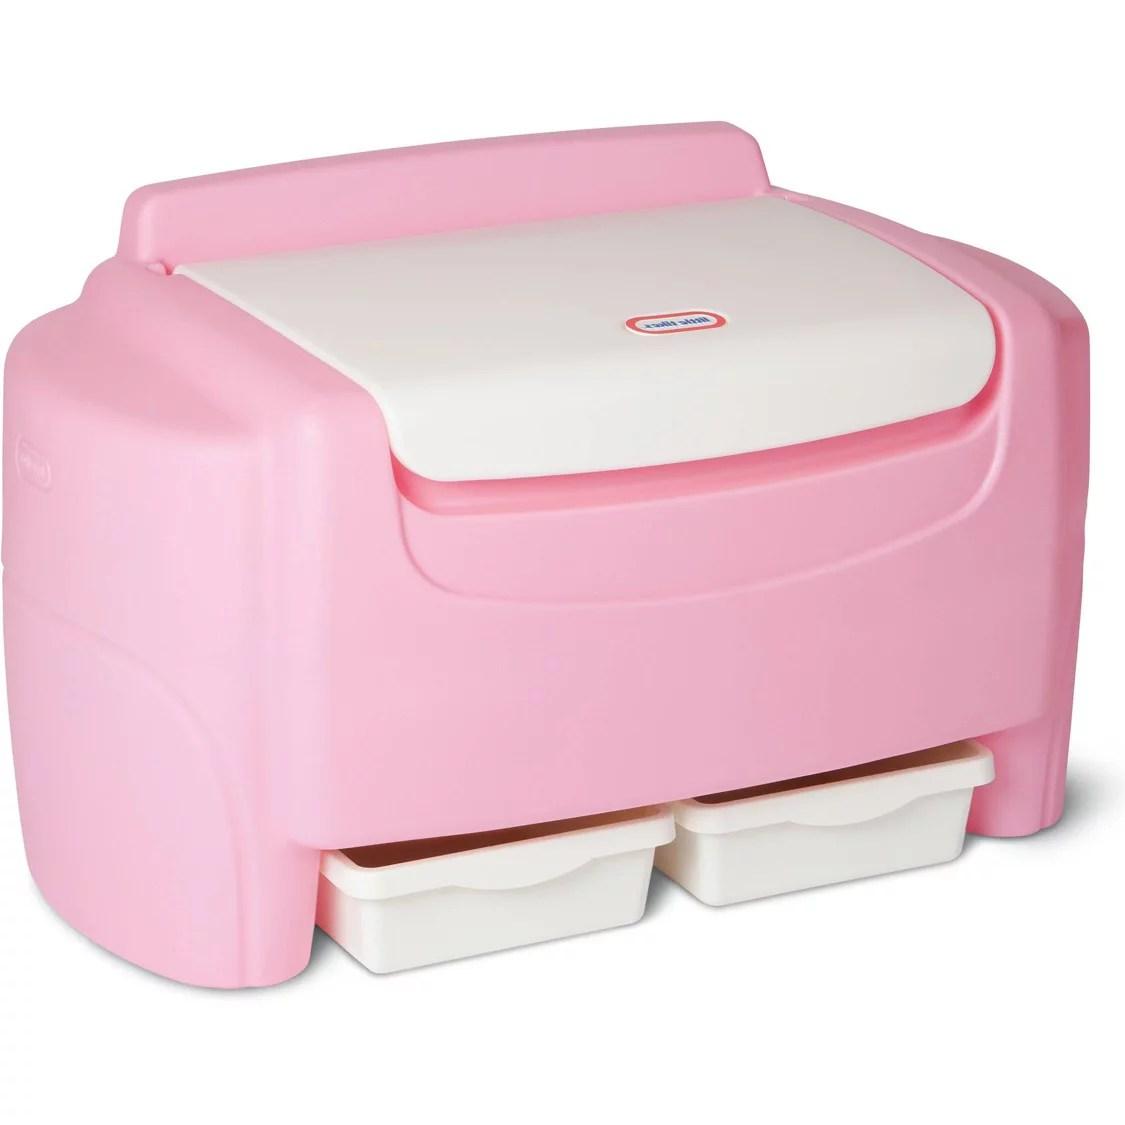 Little Tikes Pink Sort N Store Toy Chest Walmart